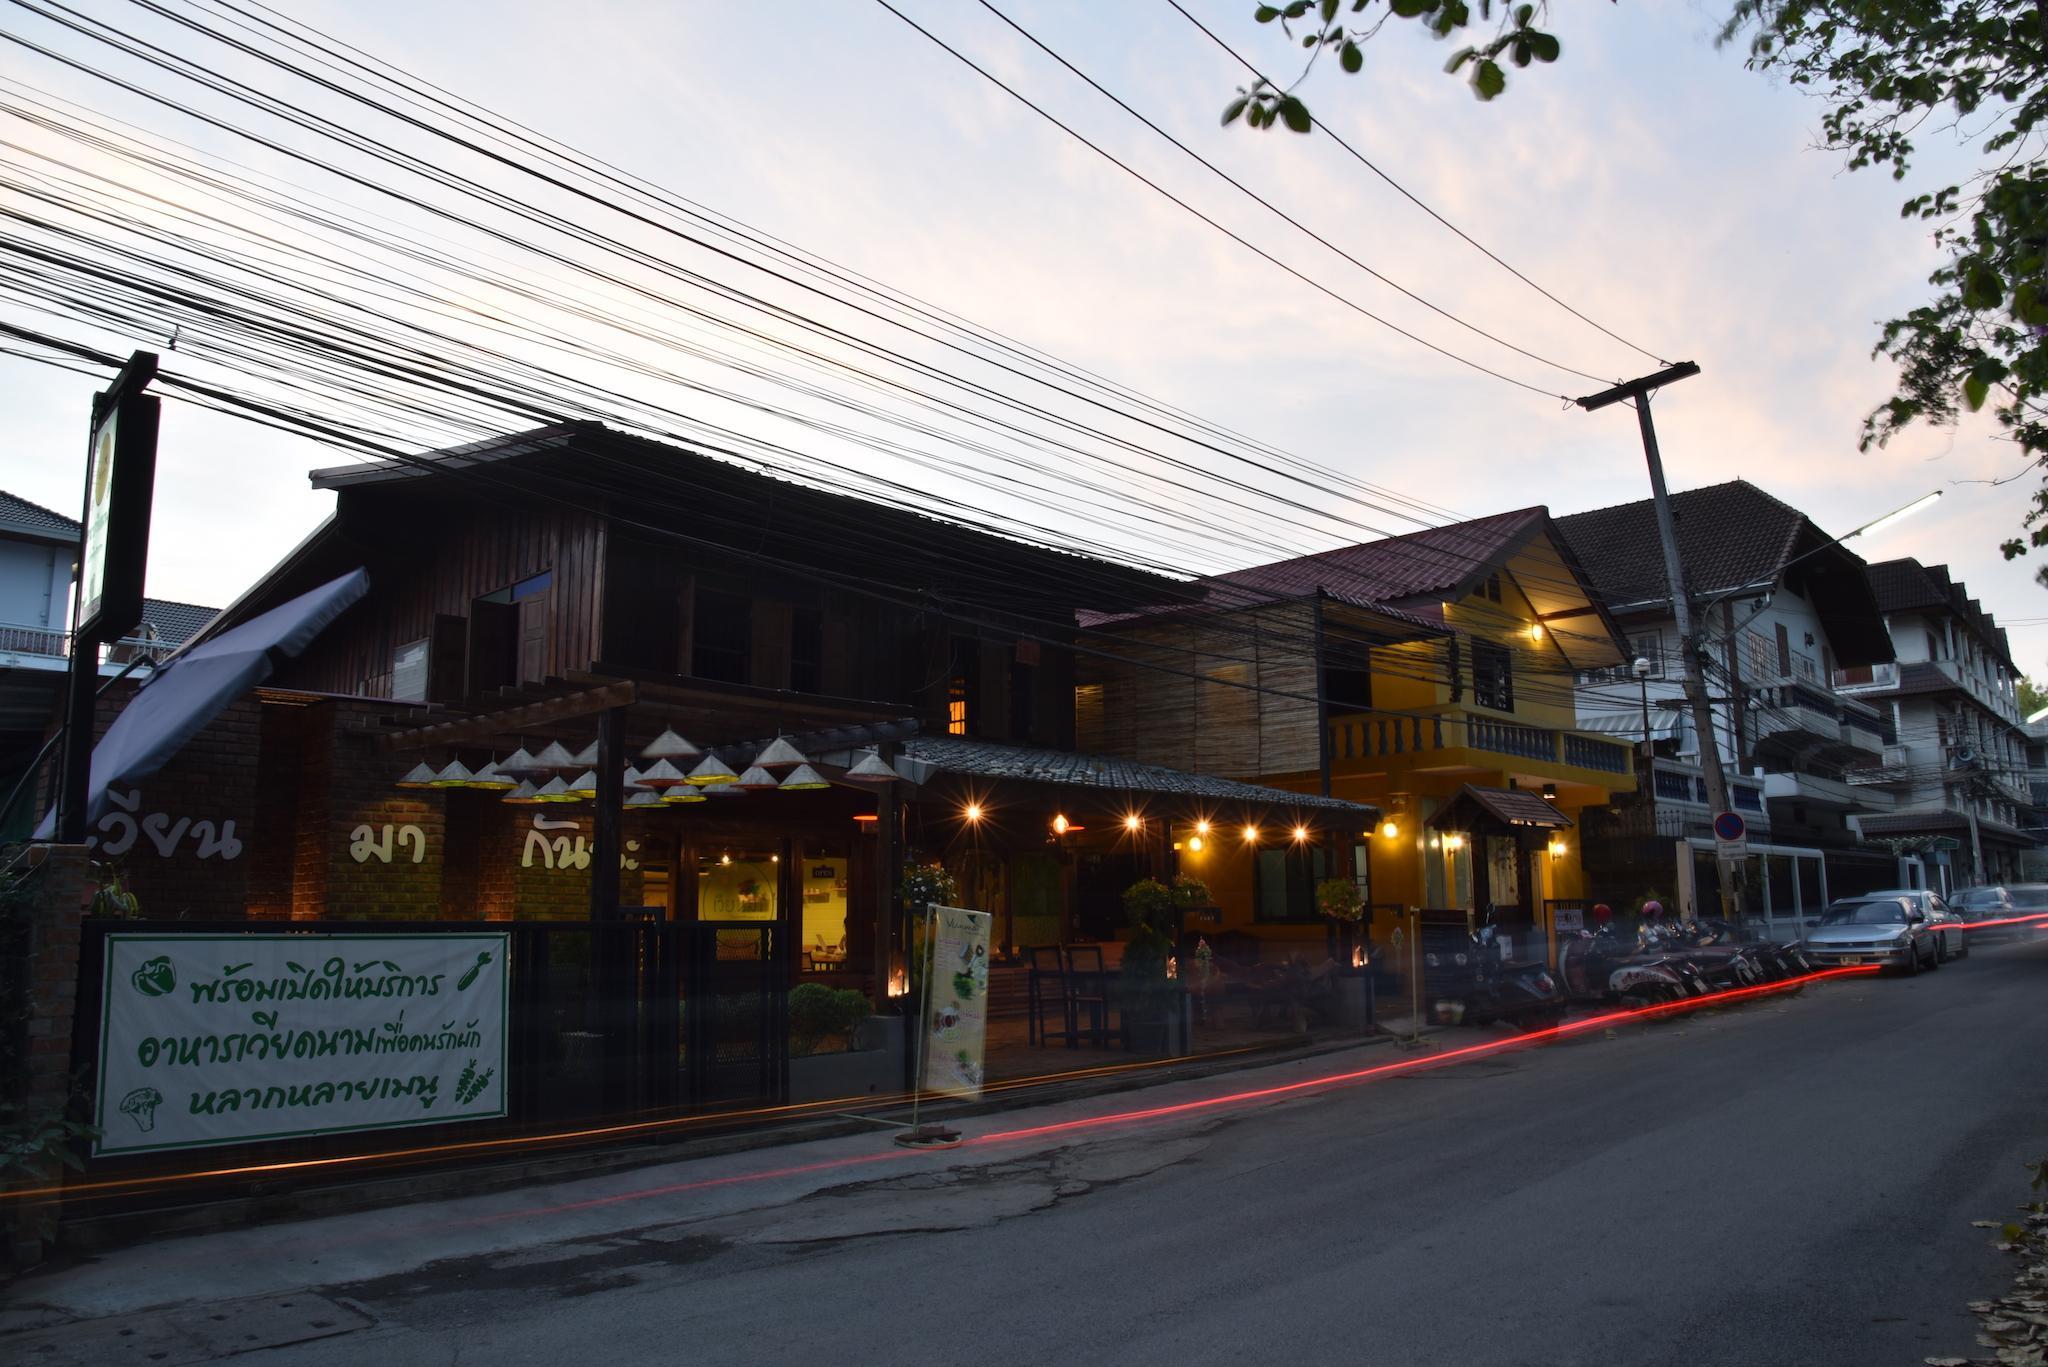 柏马旅馆,Pama Guesthouse